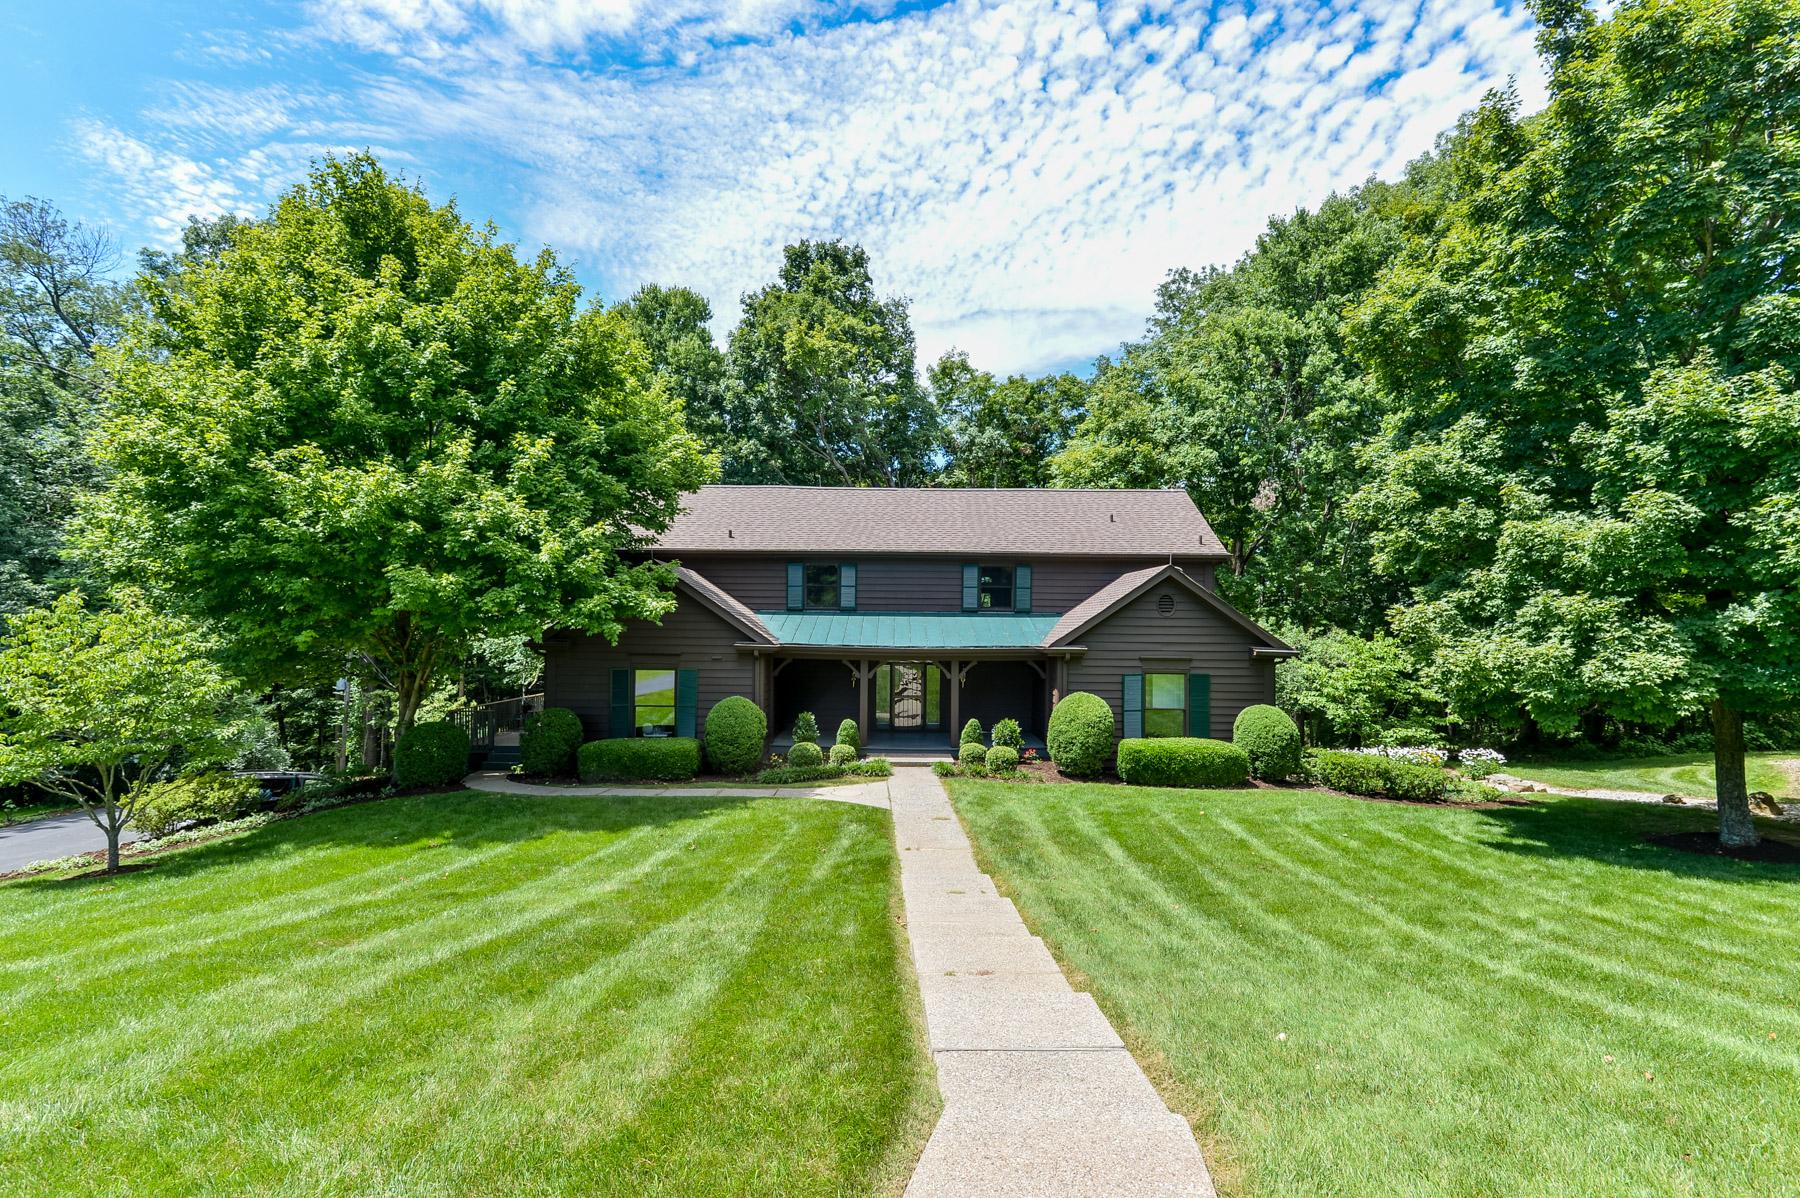 Single Family Home for Sale at 2005 Goshen Lane Goshen, Kentucky 40026 United States